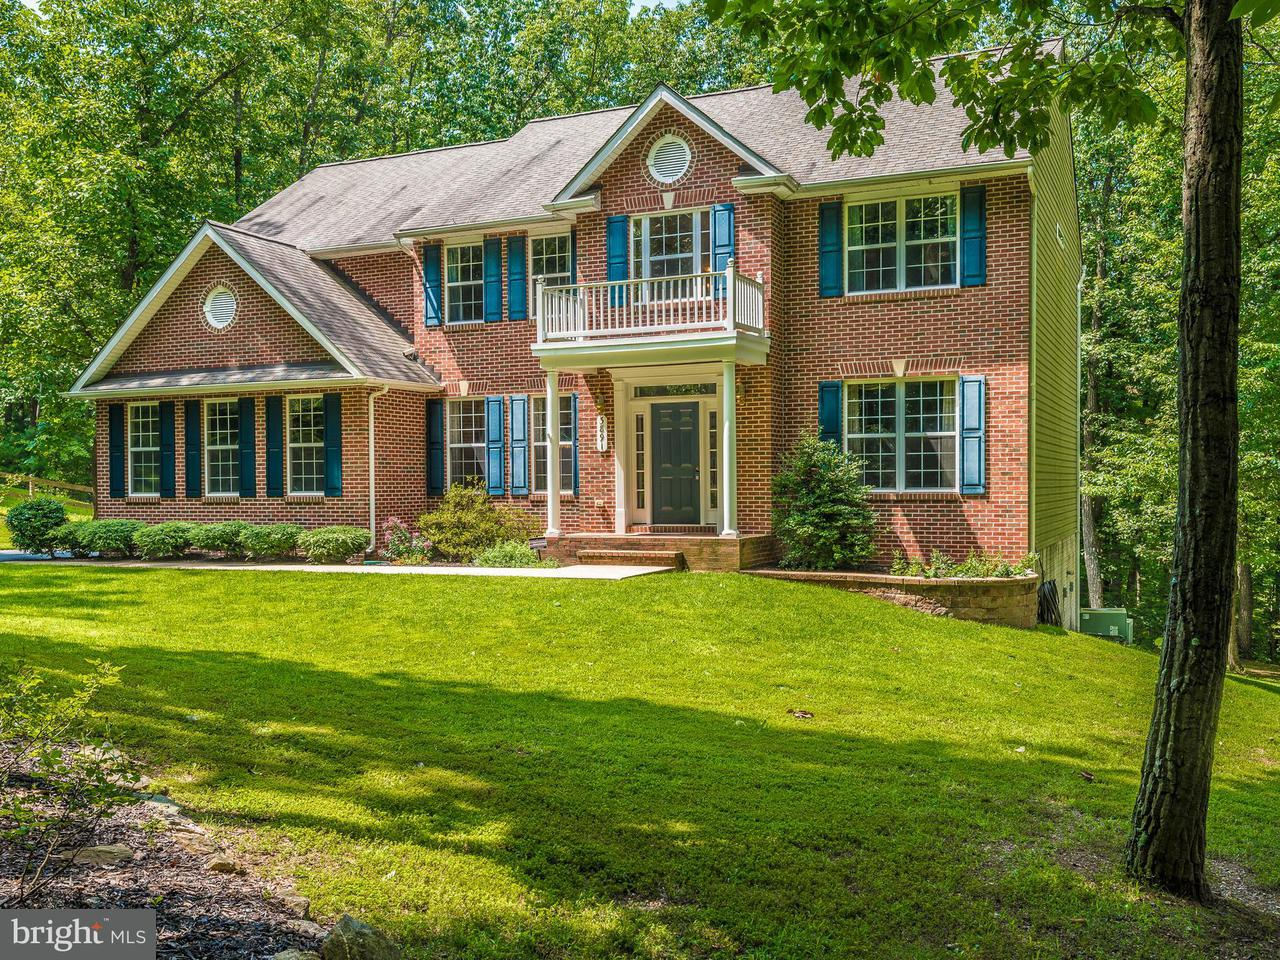 独户住宅 为 销售 在 3891 Buffalo Road 3891 Buffalo Road New Windsor, 马里兰州 21776 美国